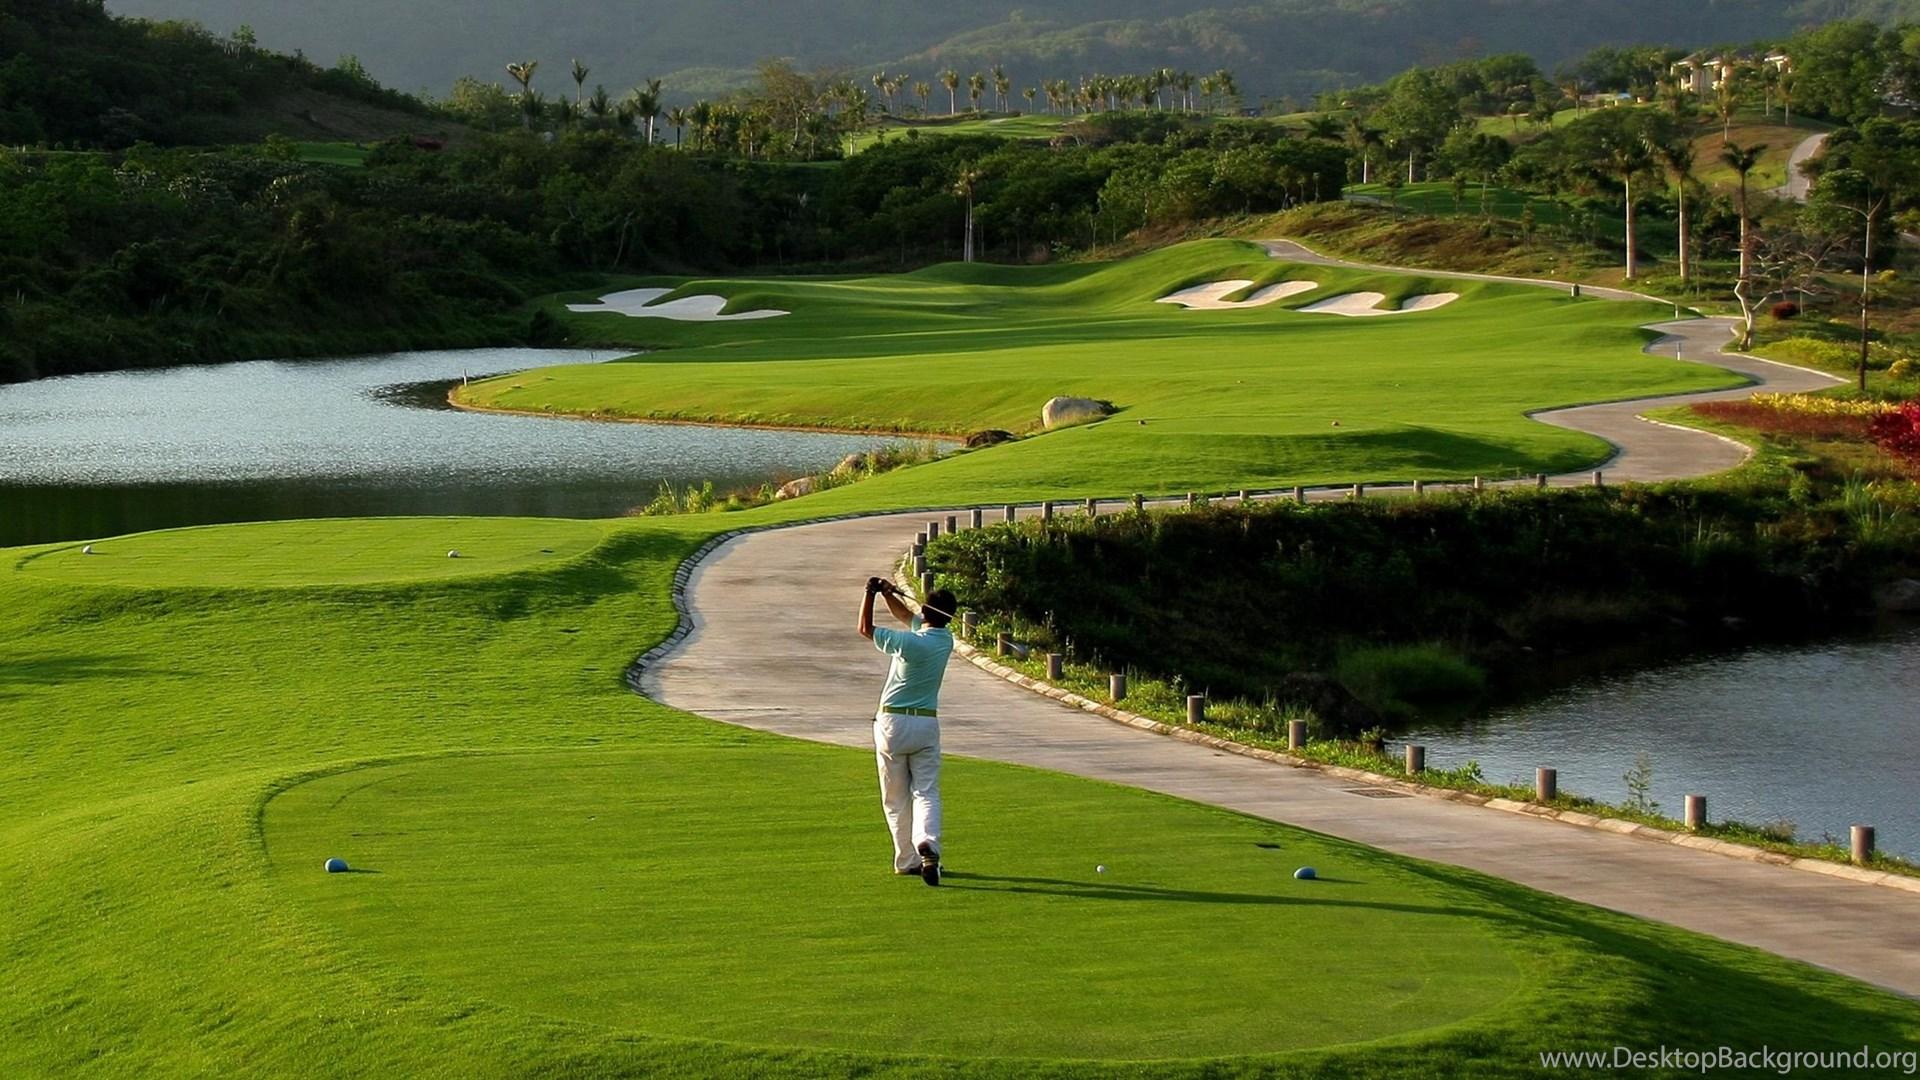 Golf Hd Wallpapers Desktop Background